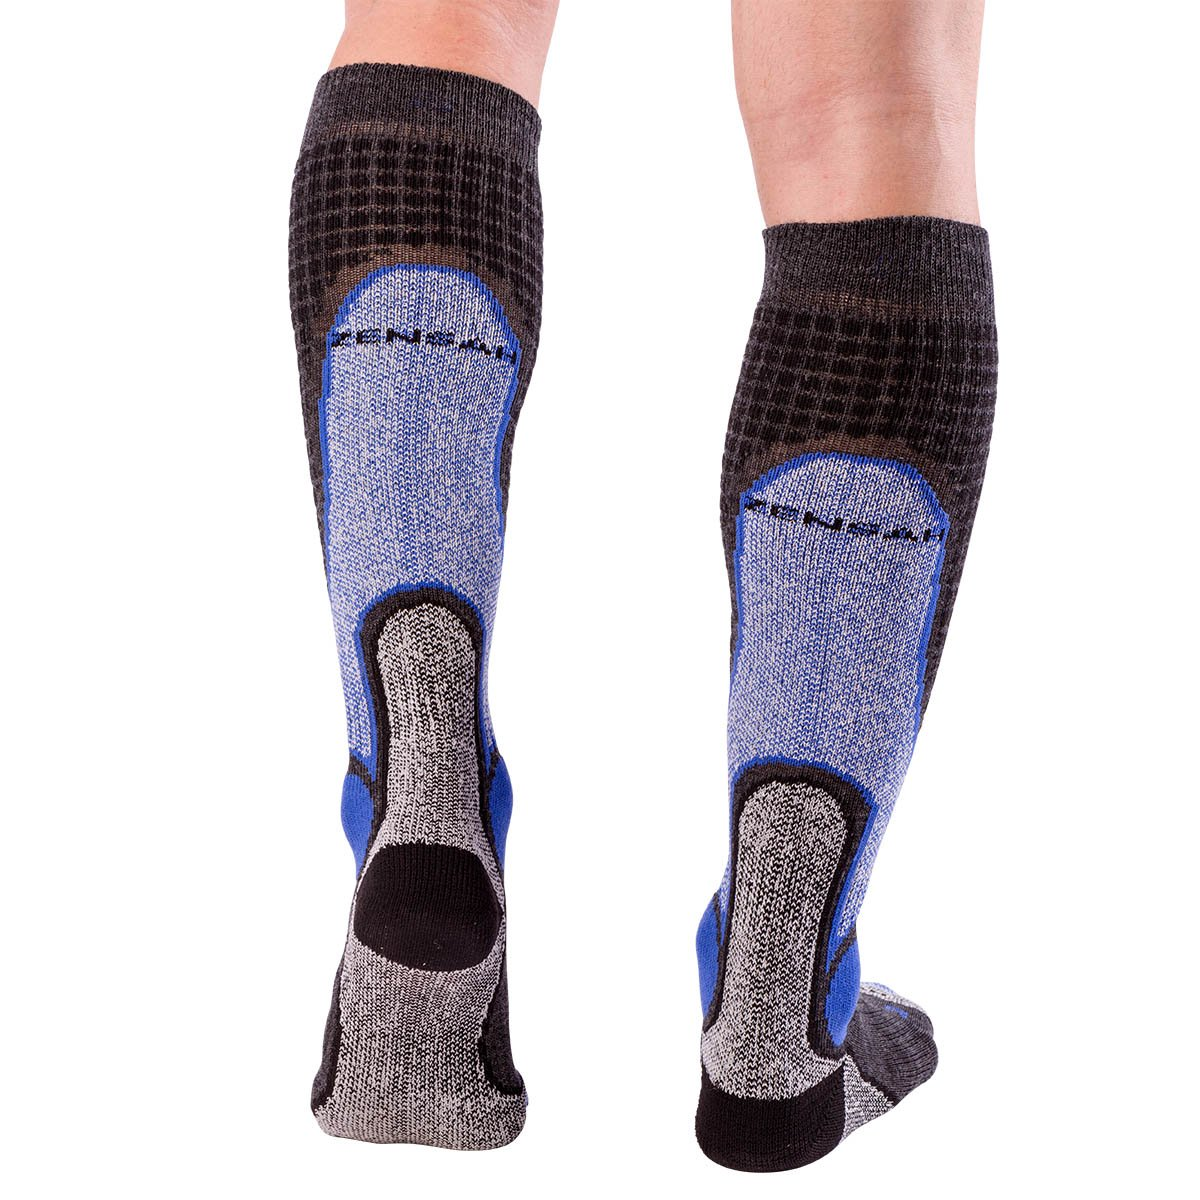 0e79bca2c9541 Amazon.com : Zensah Ski Socks - Warm Merino Wool Skiing / Snowboard Socks  for Men and Women : Sports & Outdoors